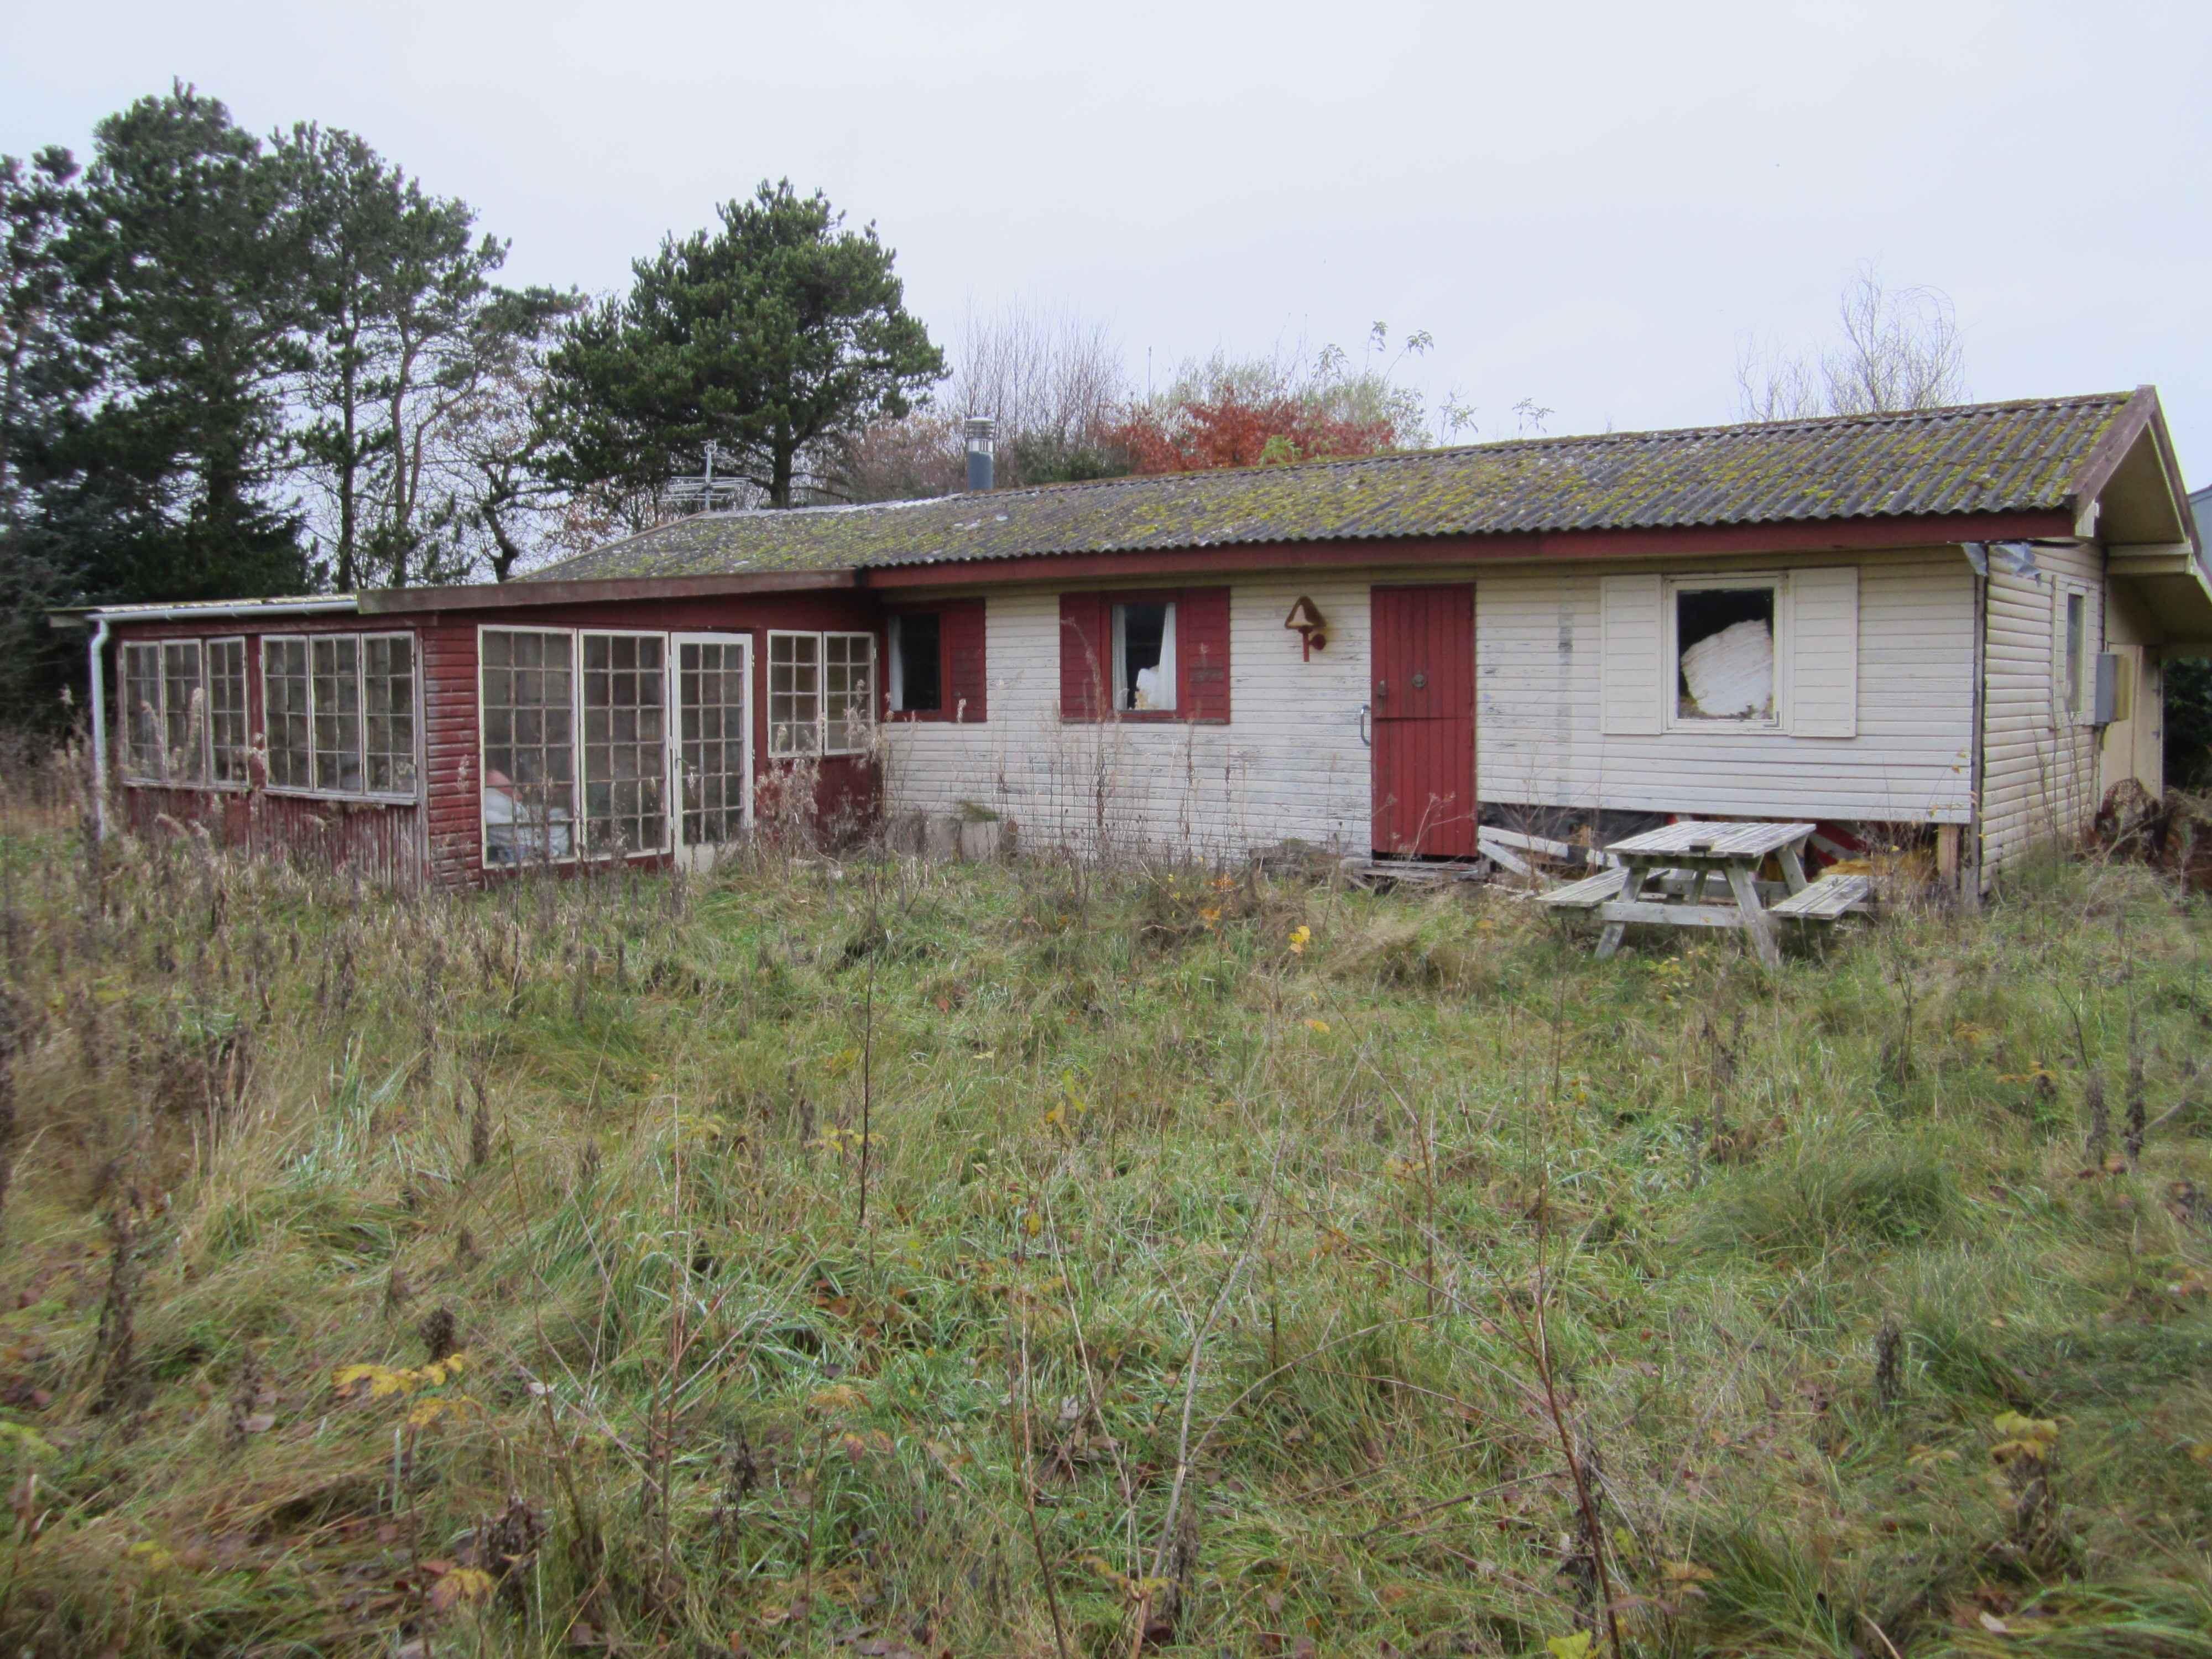 Plantagen Haslevgårde 32, Haslevgaarde, 9560 Hadsund